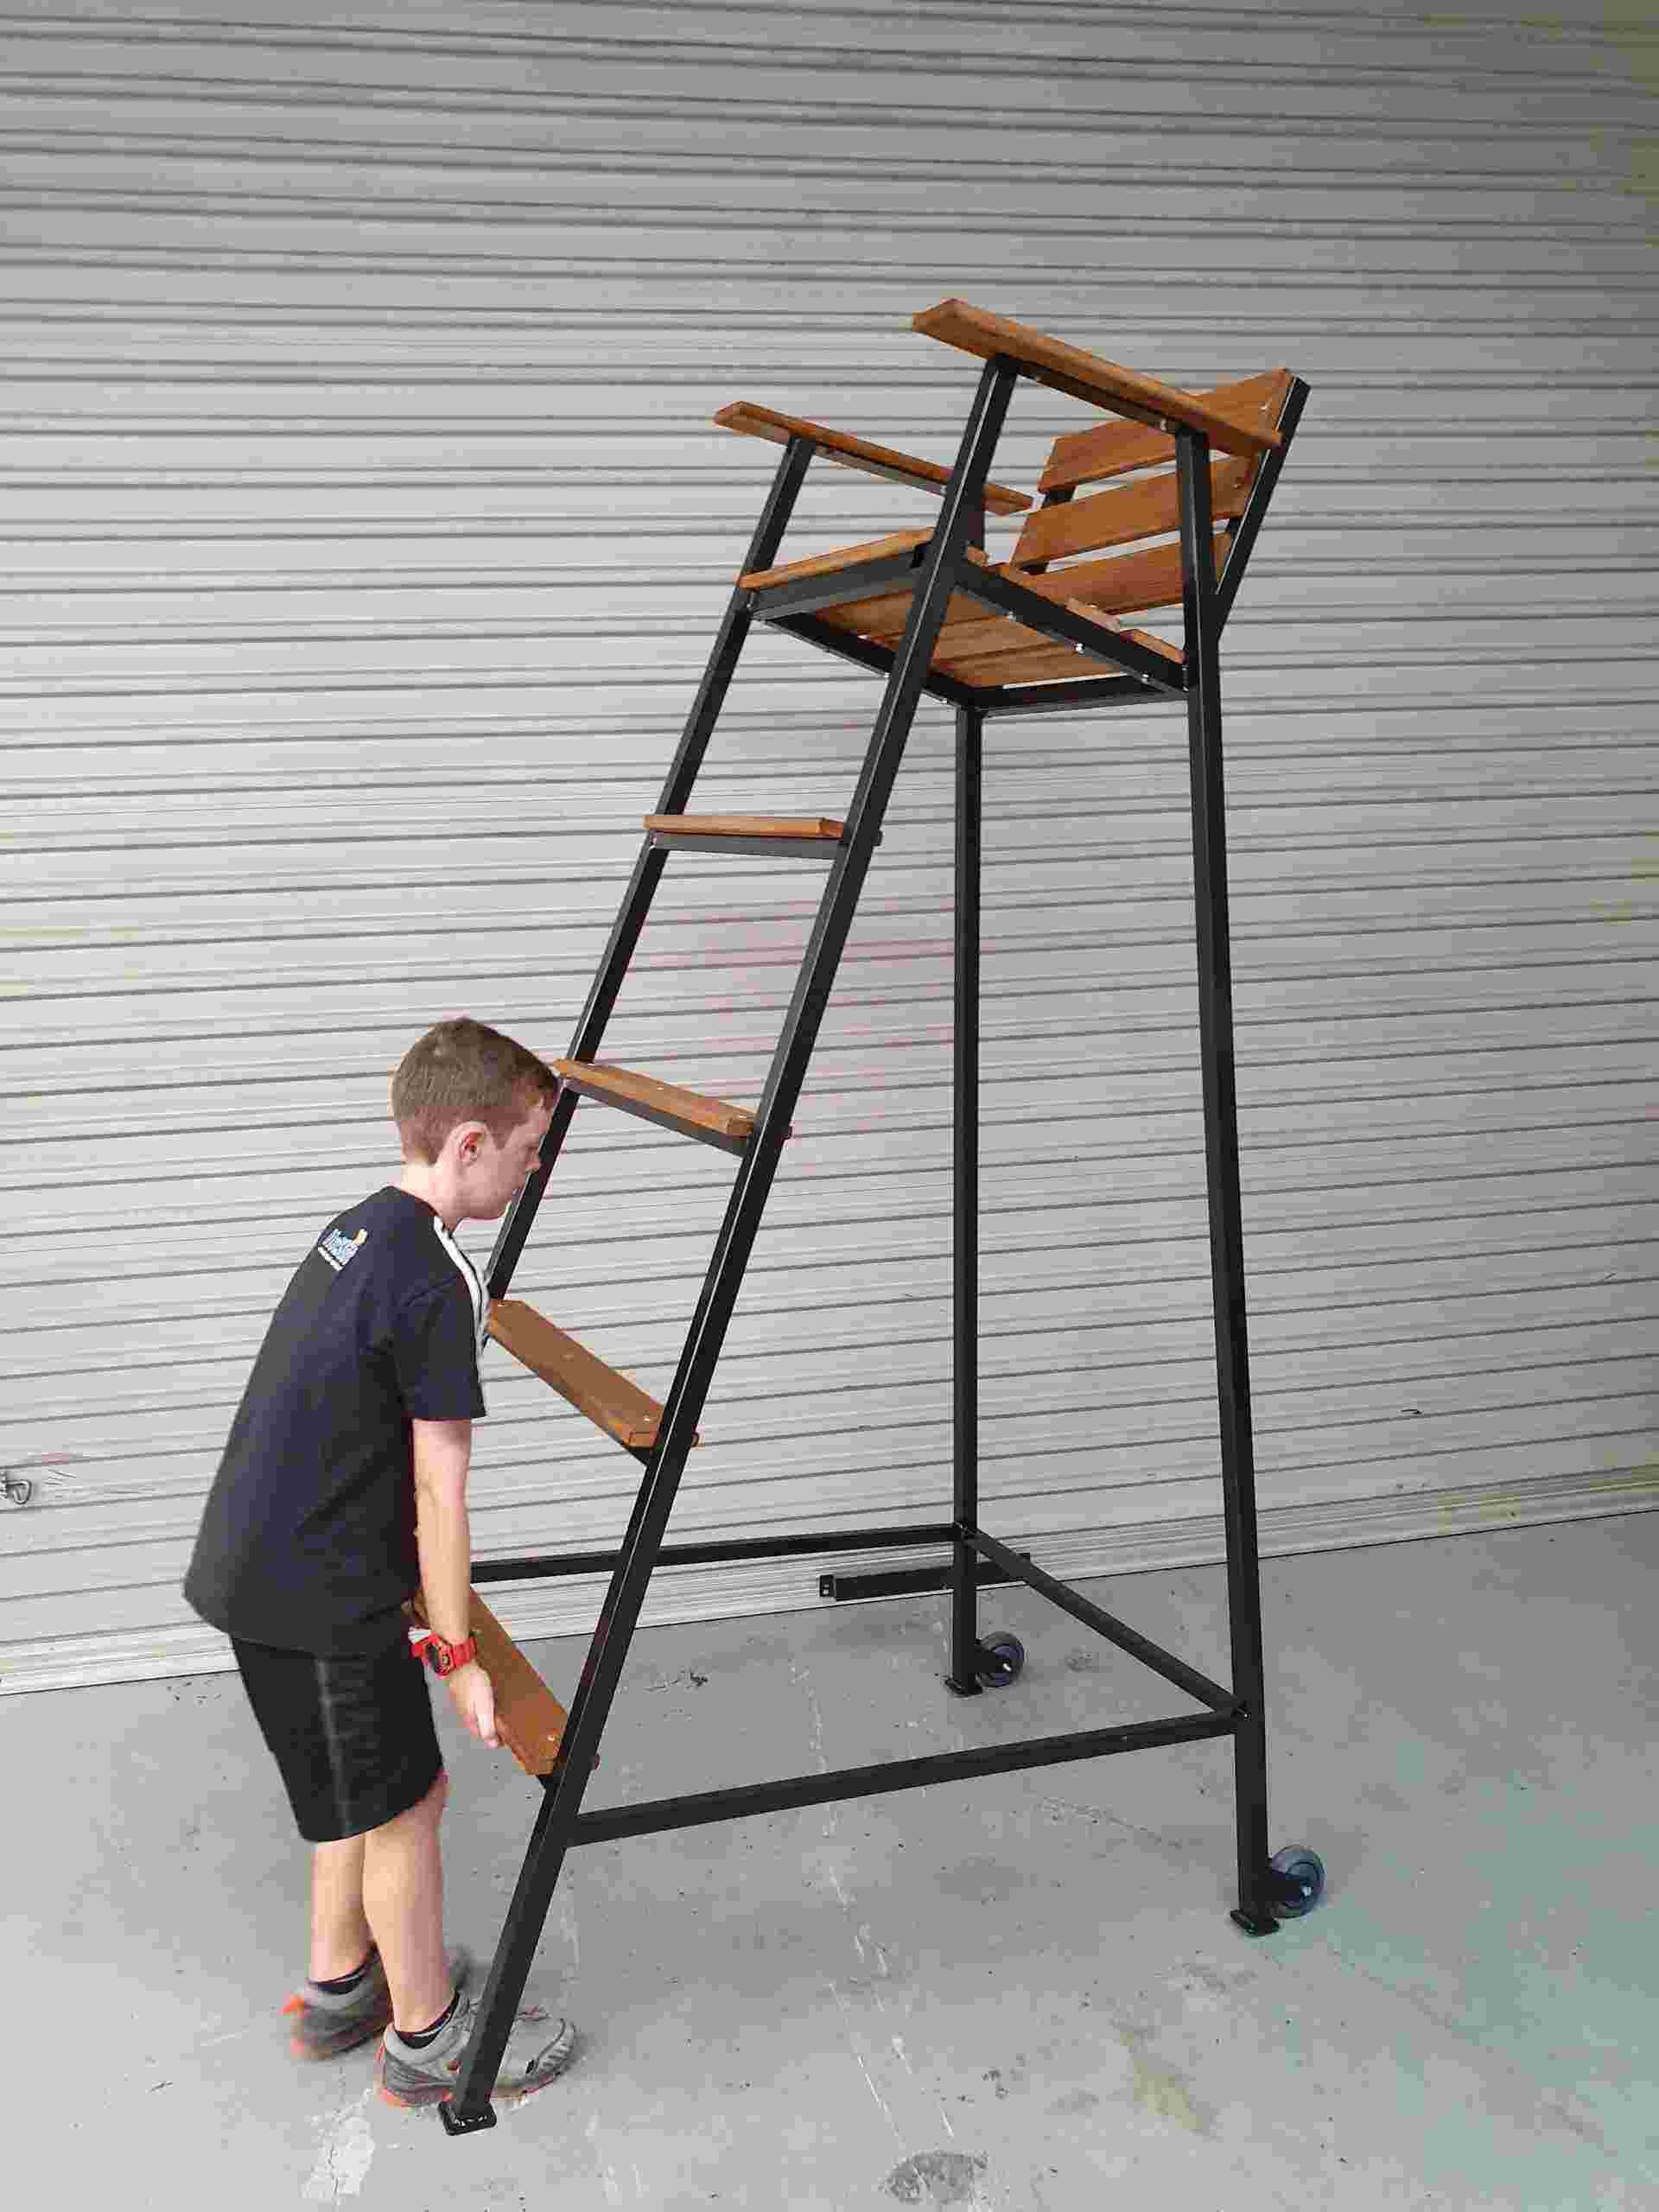 umpire stand